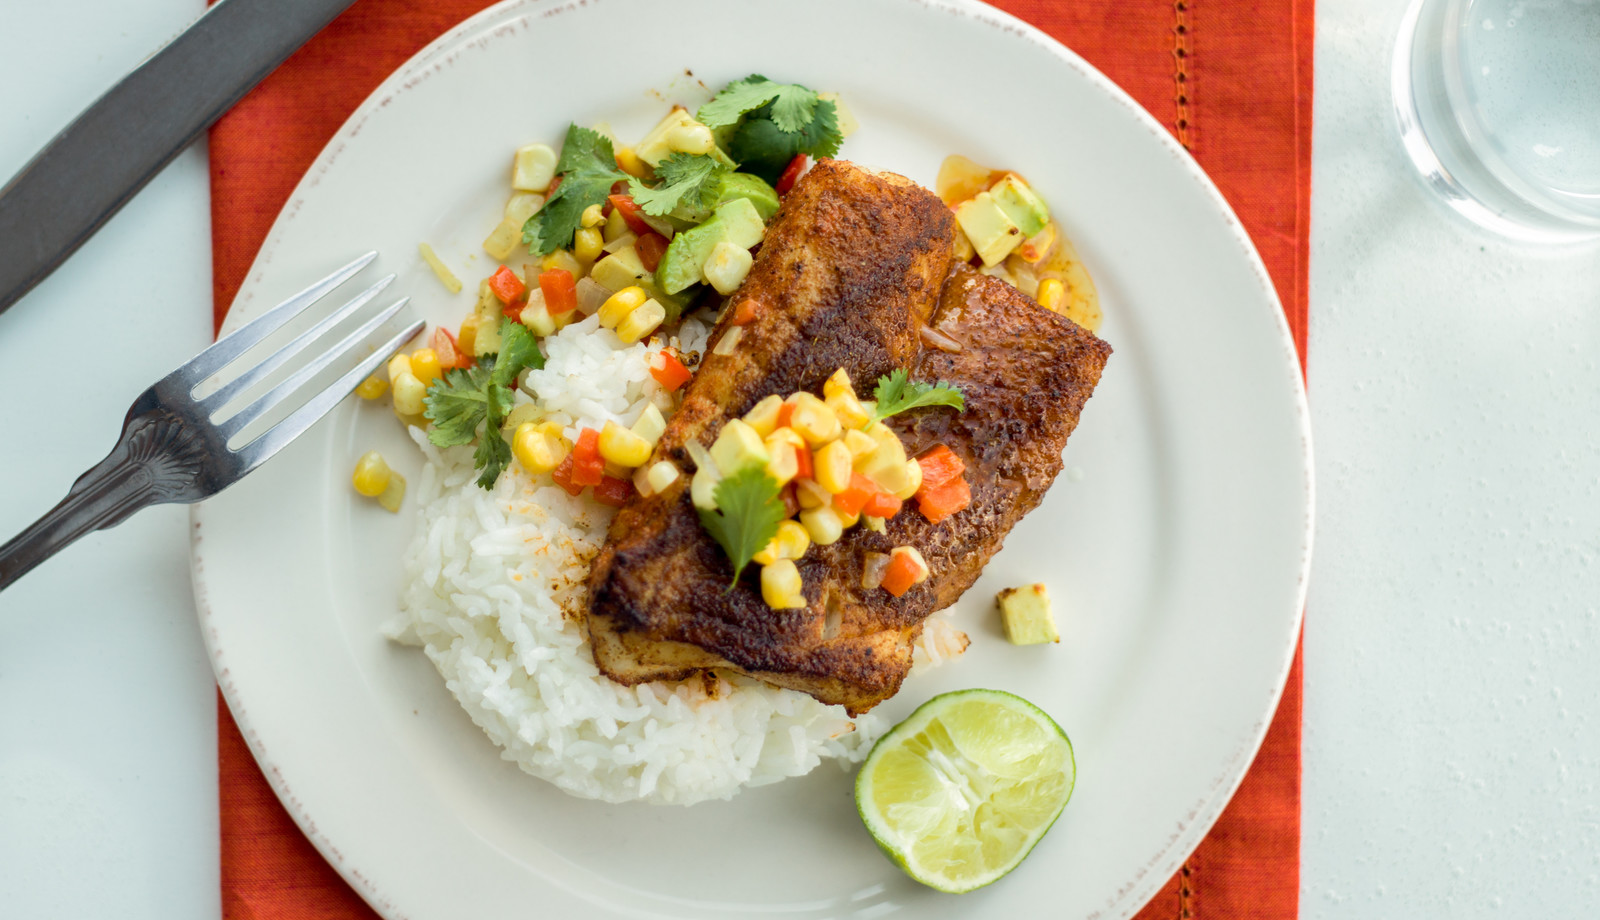 Blackened Rockfish with Avocado-Corn Salsa